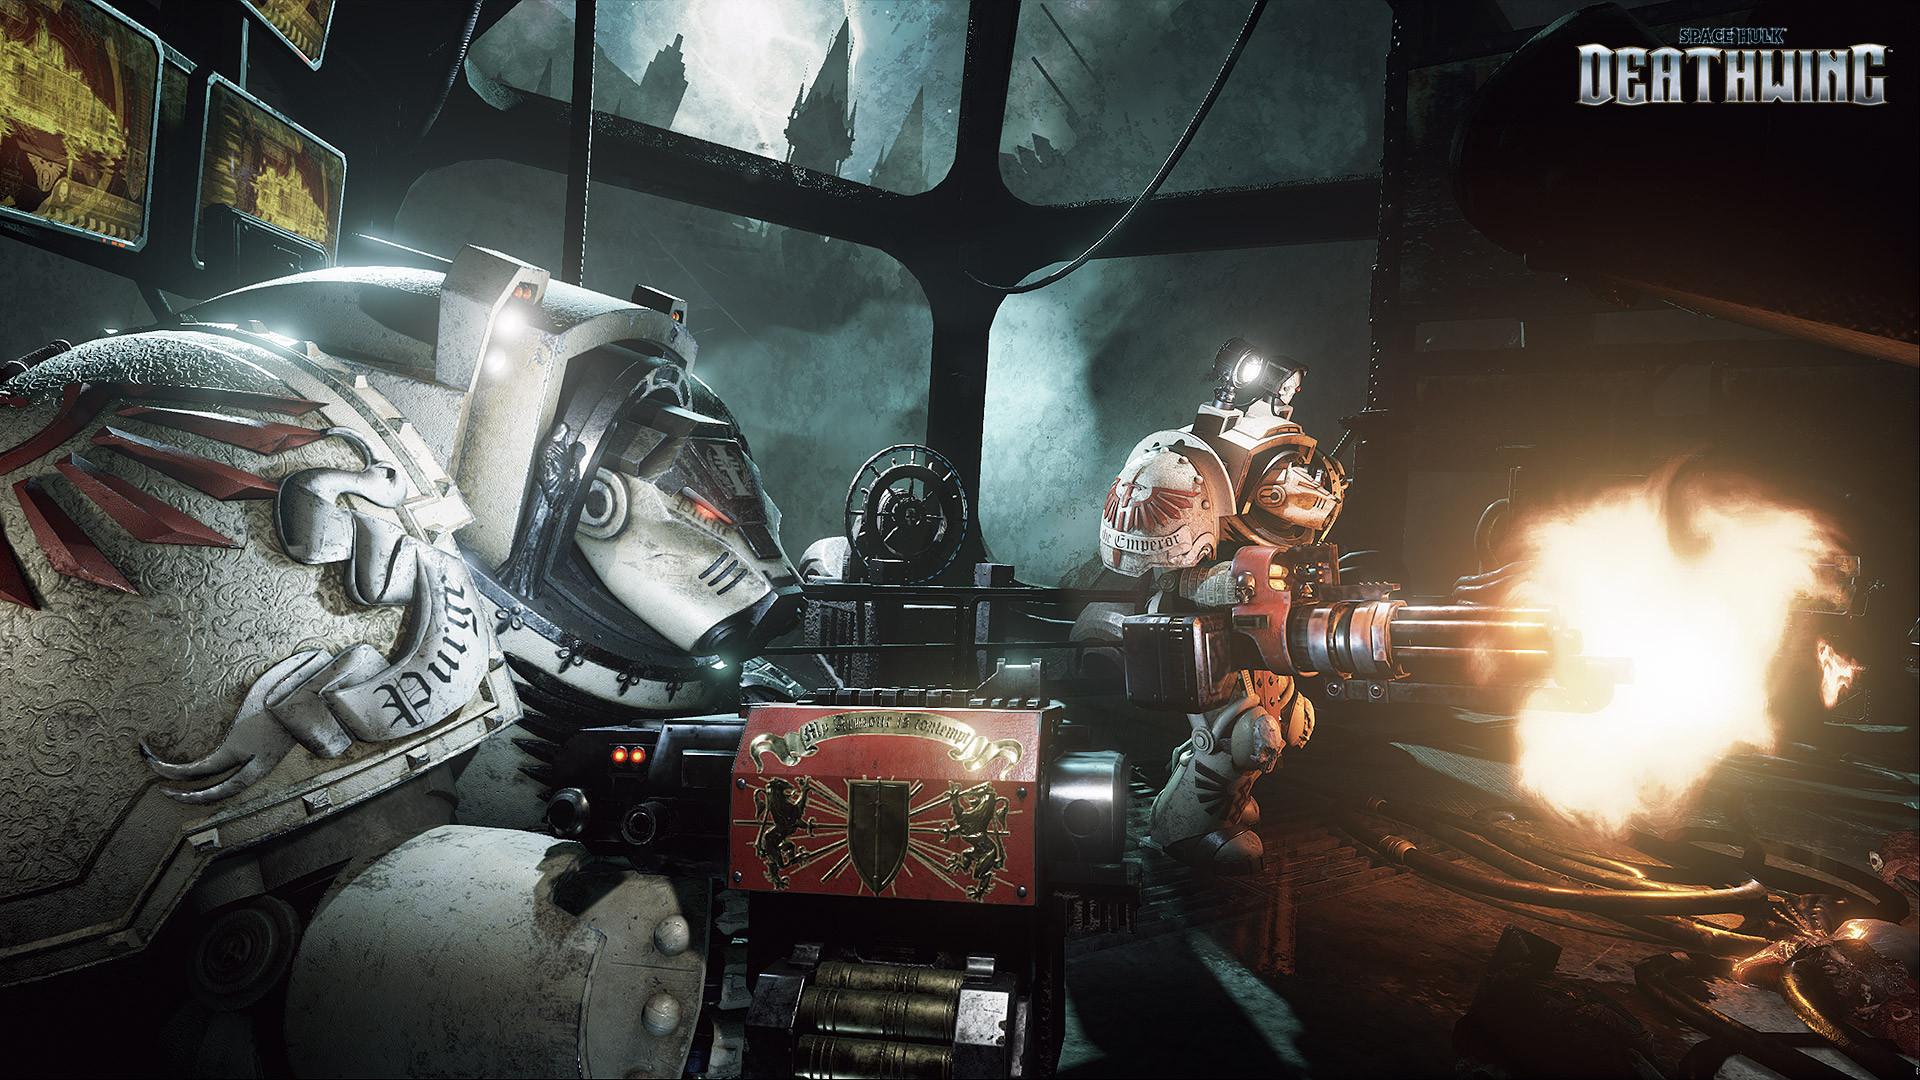 08604690-photo-space-hulk-deathwing.jpg